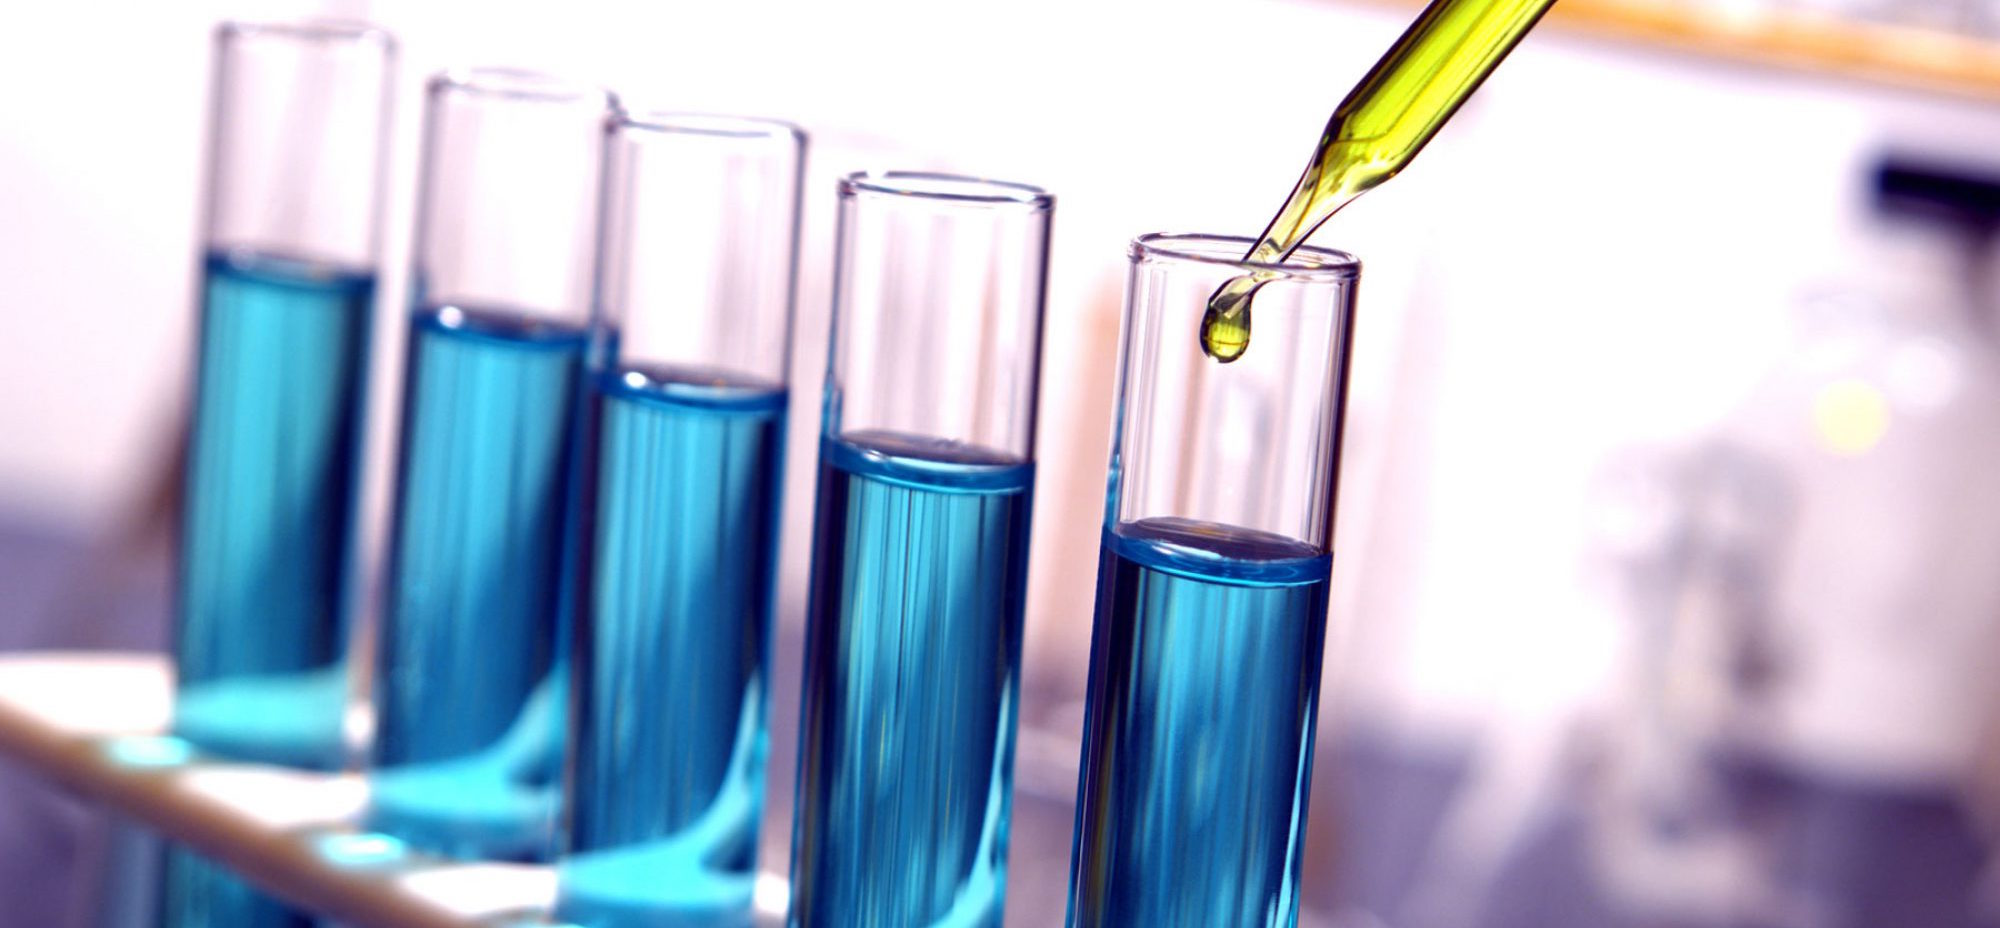 Inmunoterapia capaz de revertir la esclerosis múltiple en ratones...